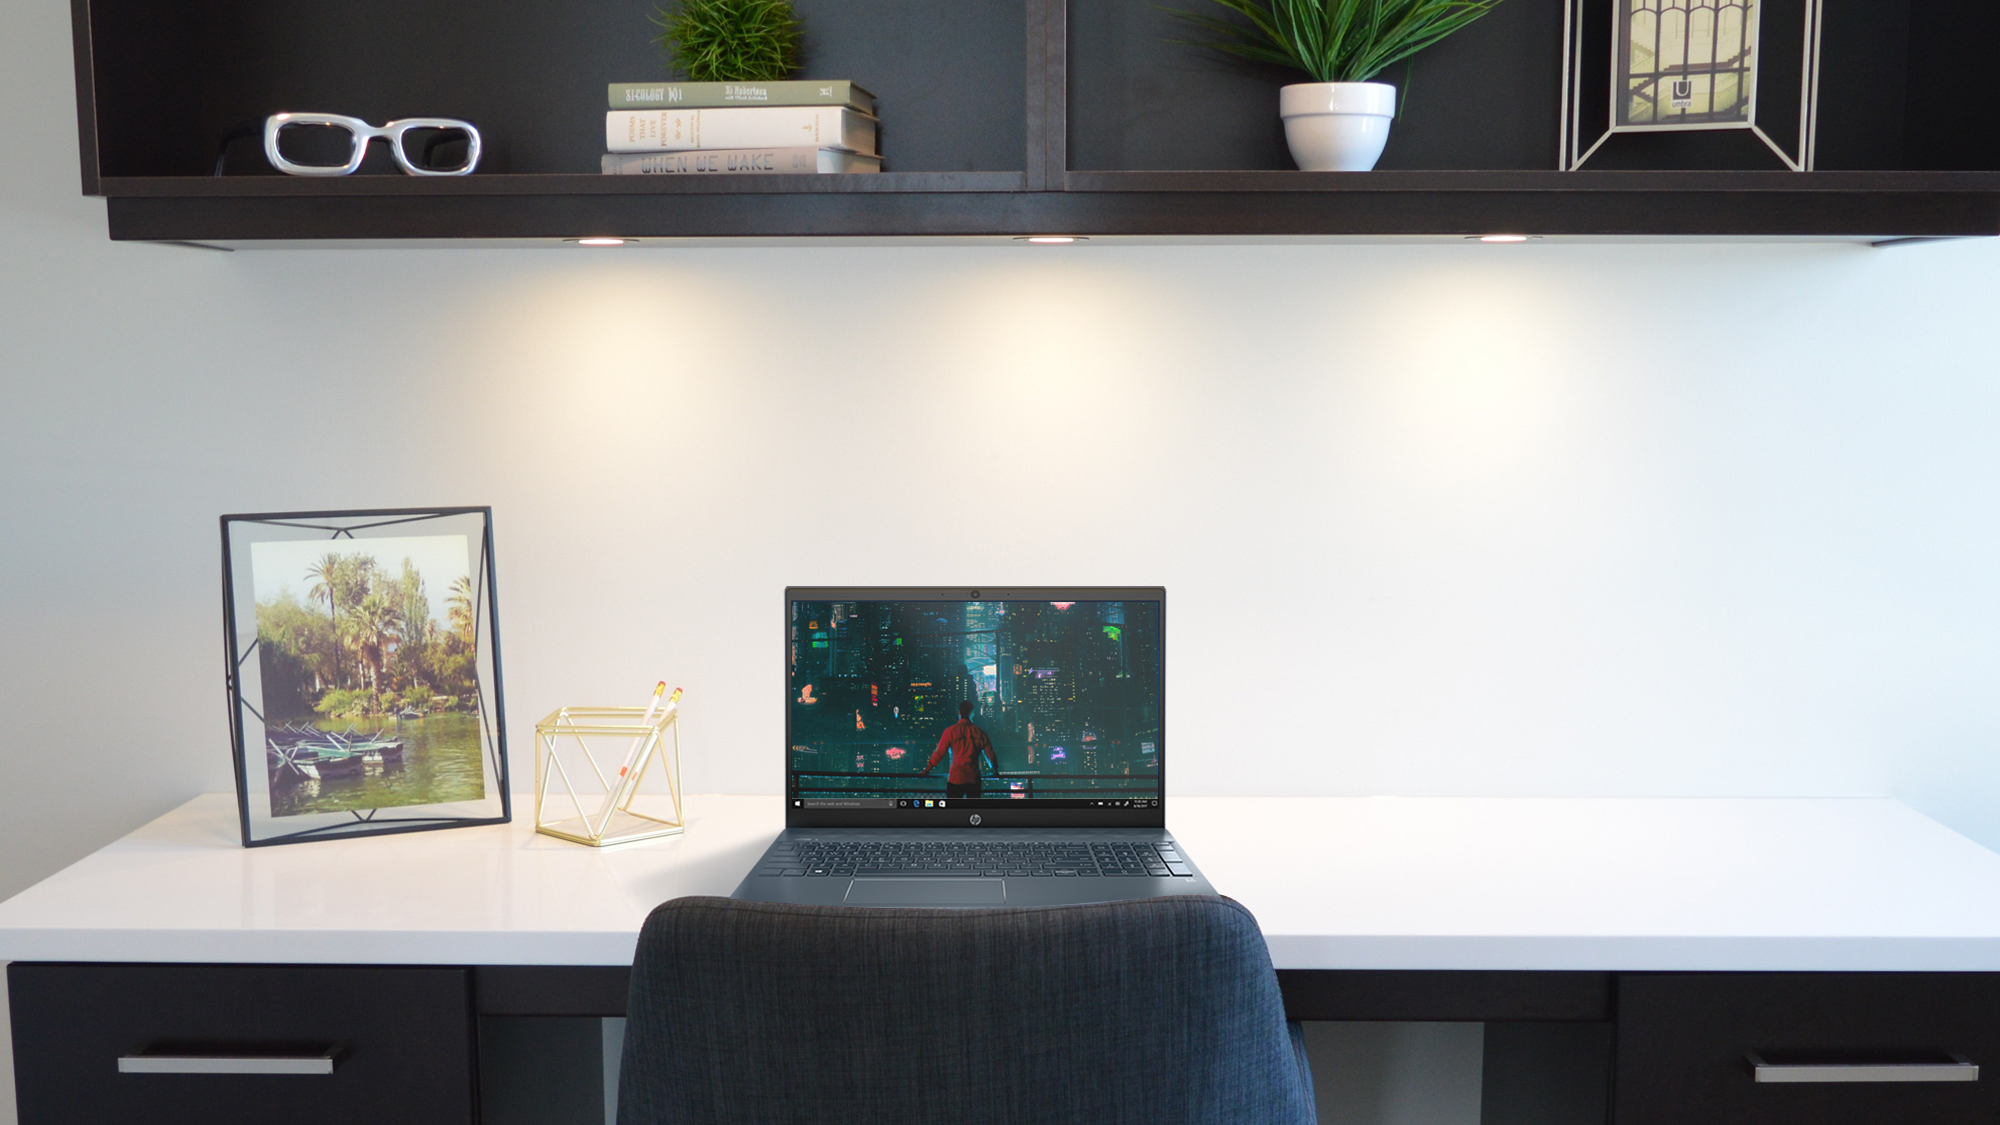 Hp Pavilion 15 Horizon Blue Laptop Should I Buy One Techradar